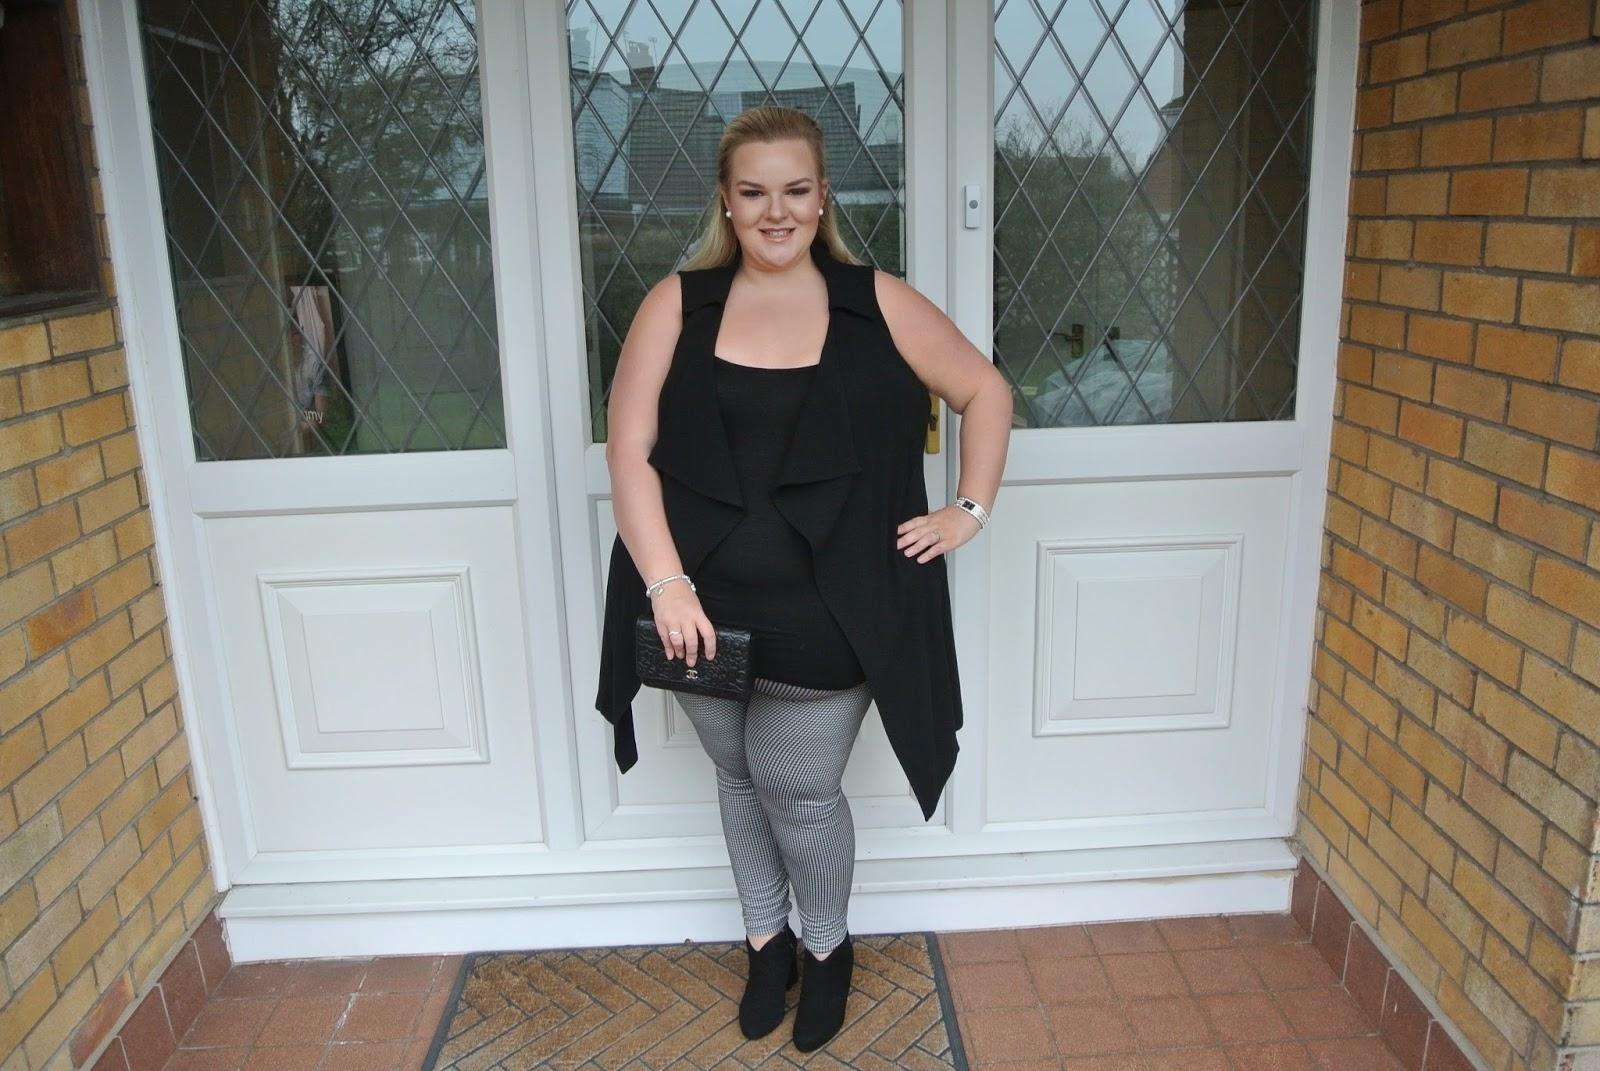 Scarlett and Jo Houndstooth Leggings Inspiring Plus Size Body Confidence